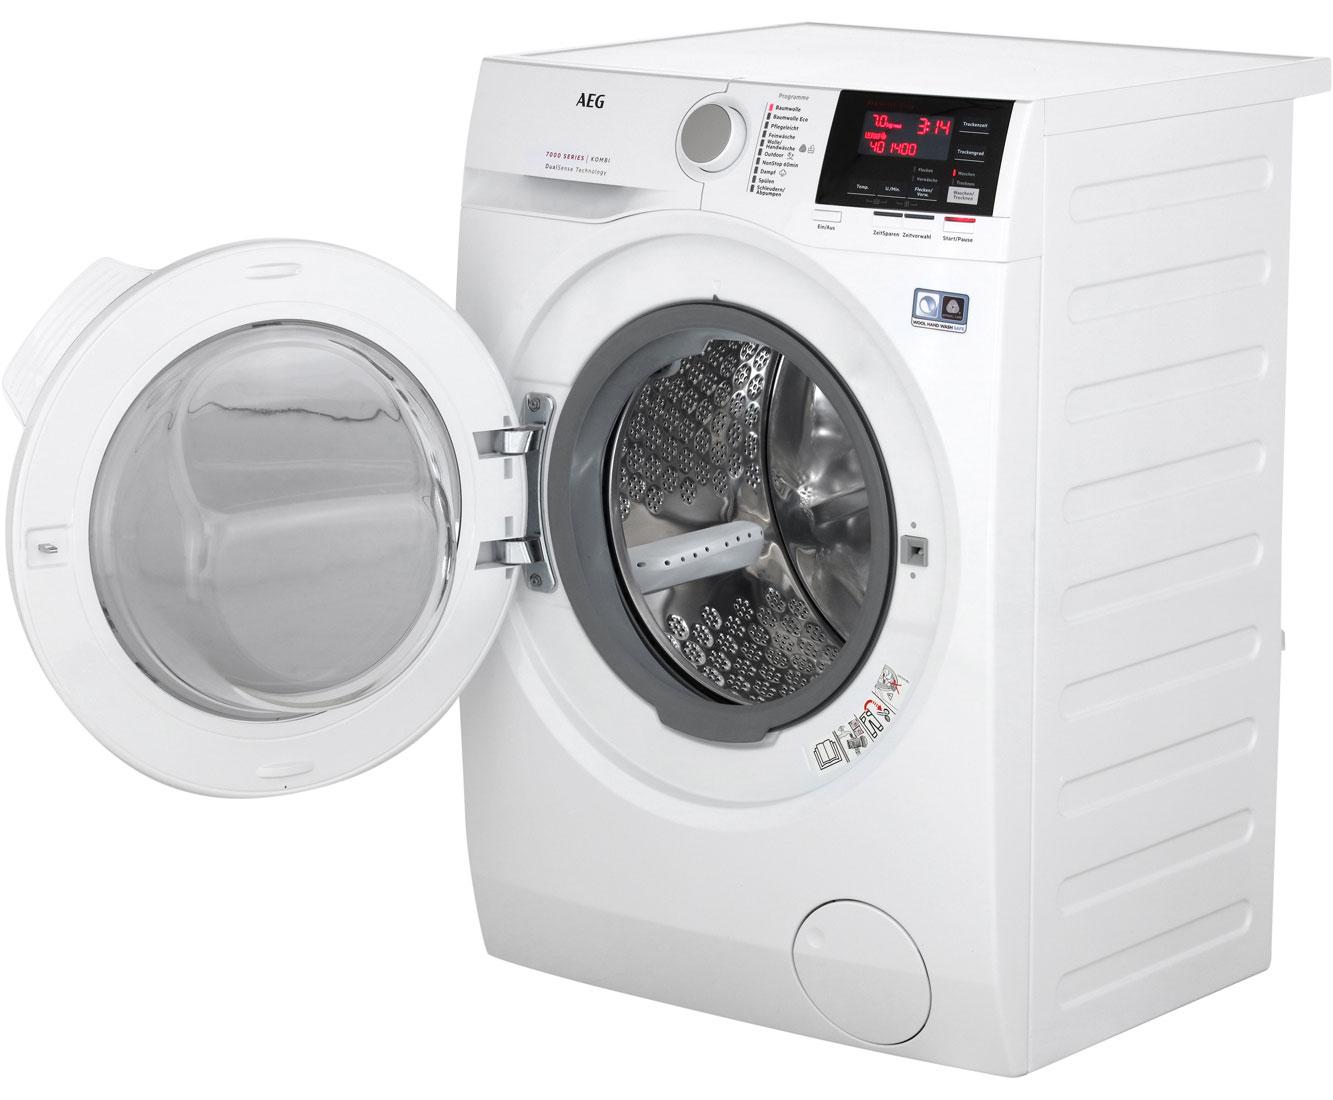 Aeg lavamat kombi l7wb64474 waschtrockner 7 kg waschen 4 kg